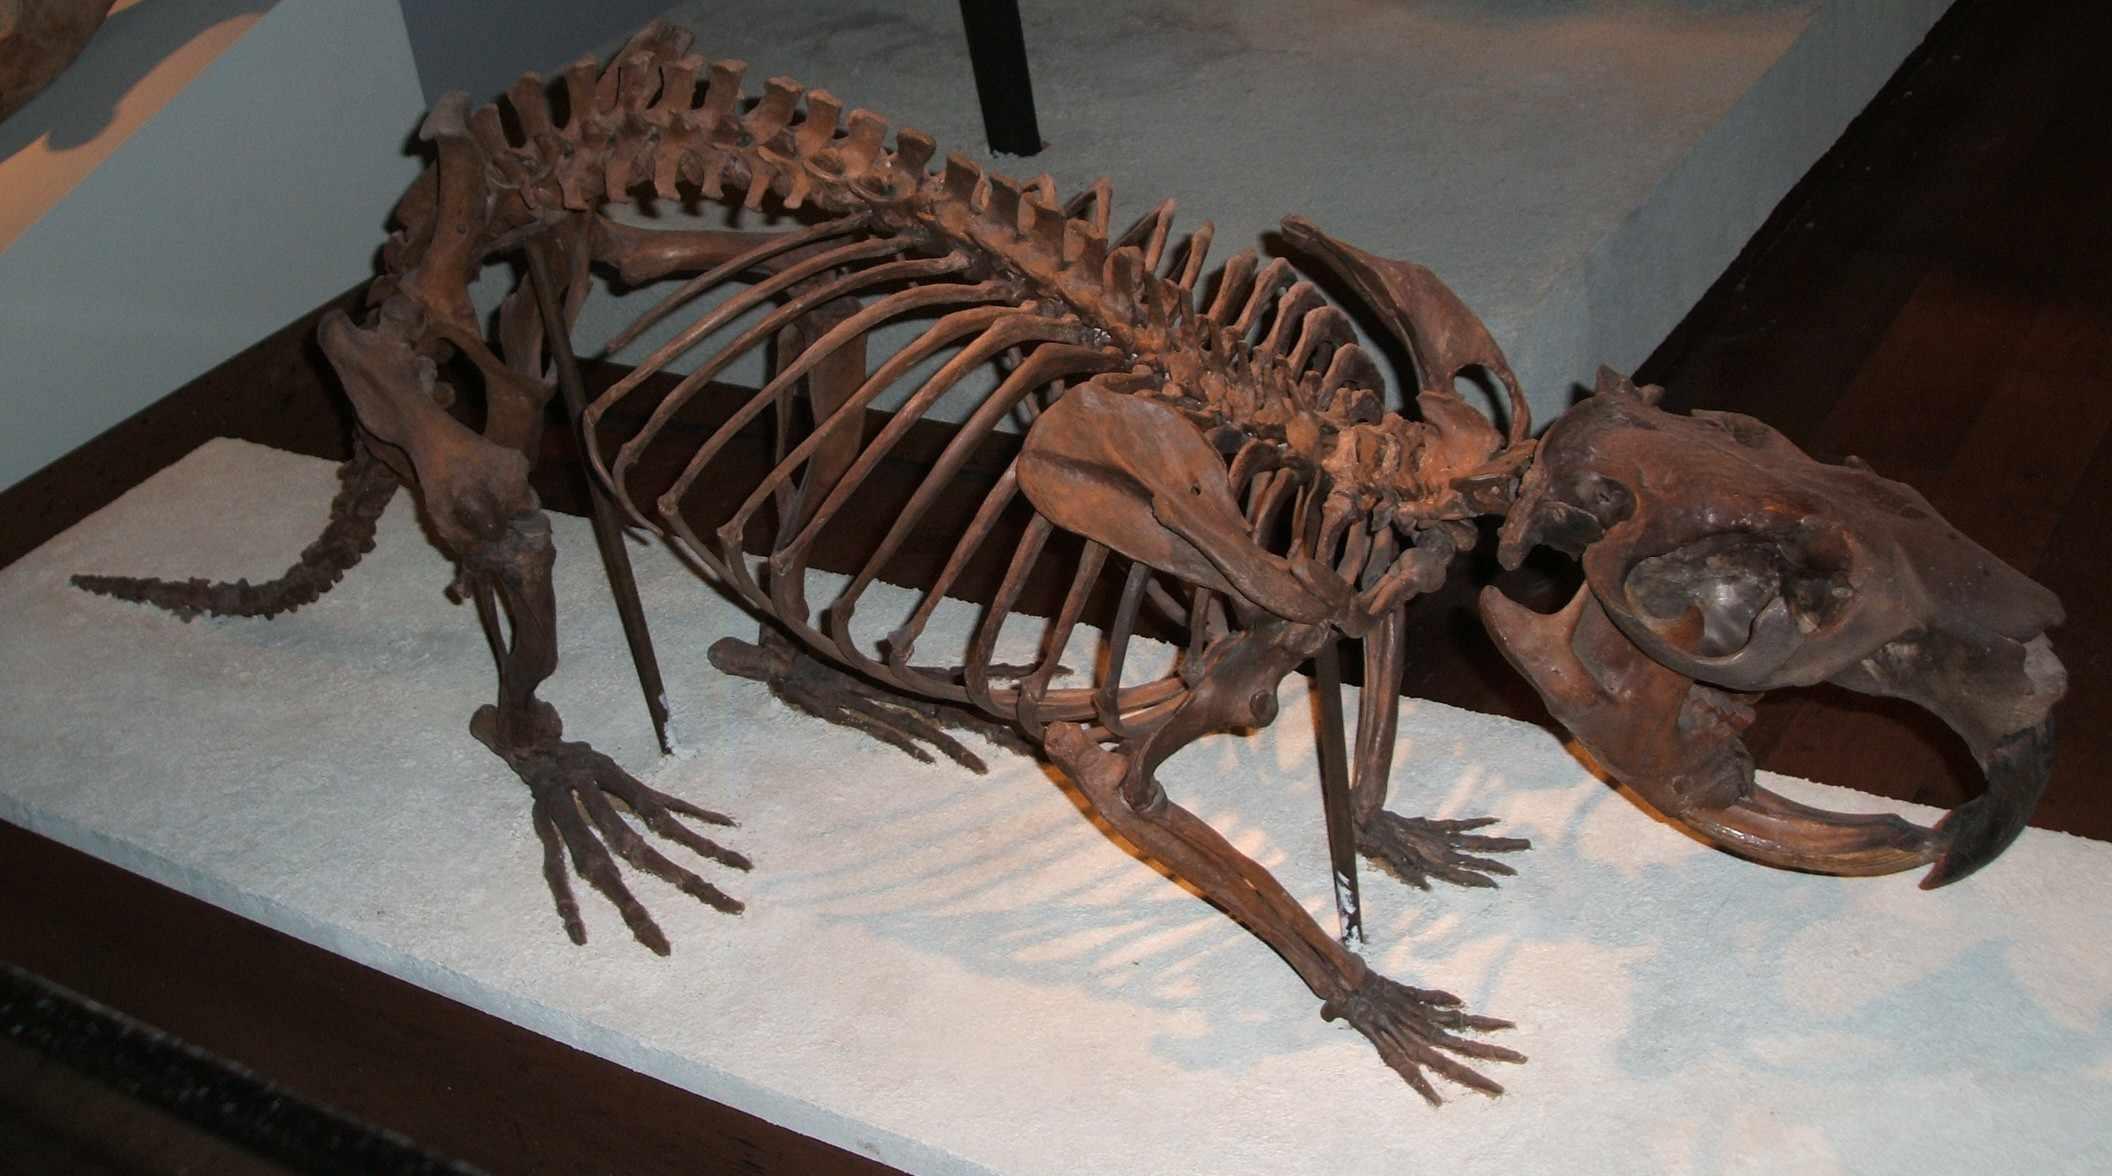 Giant beaver (Castoroides ohioensis) skeleton